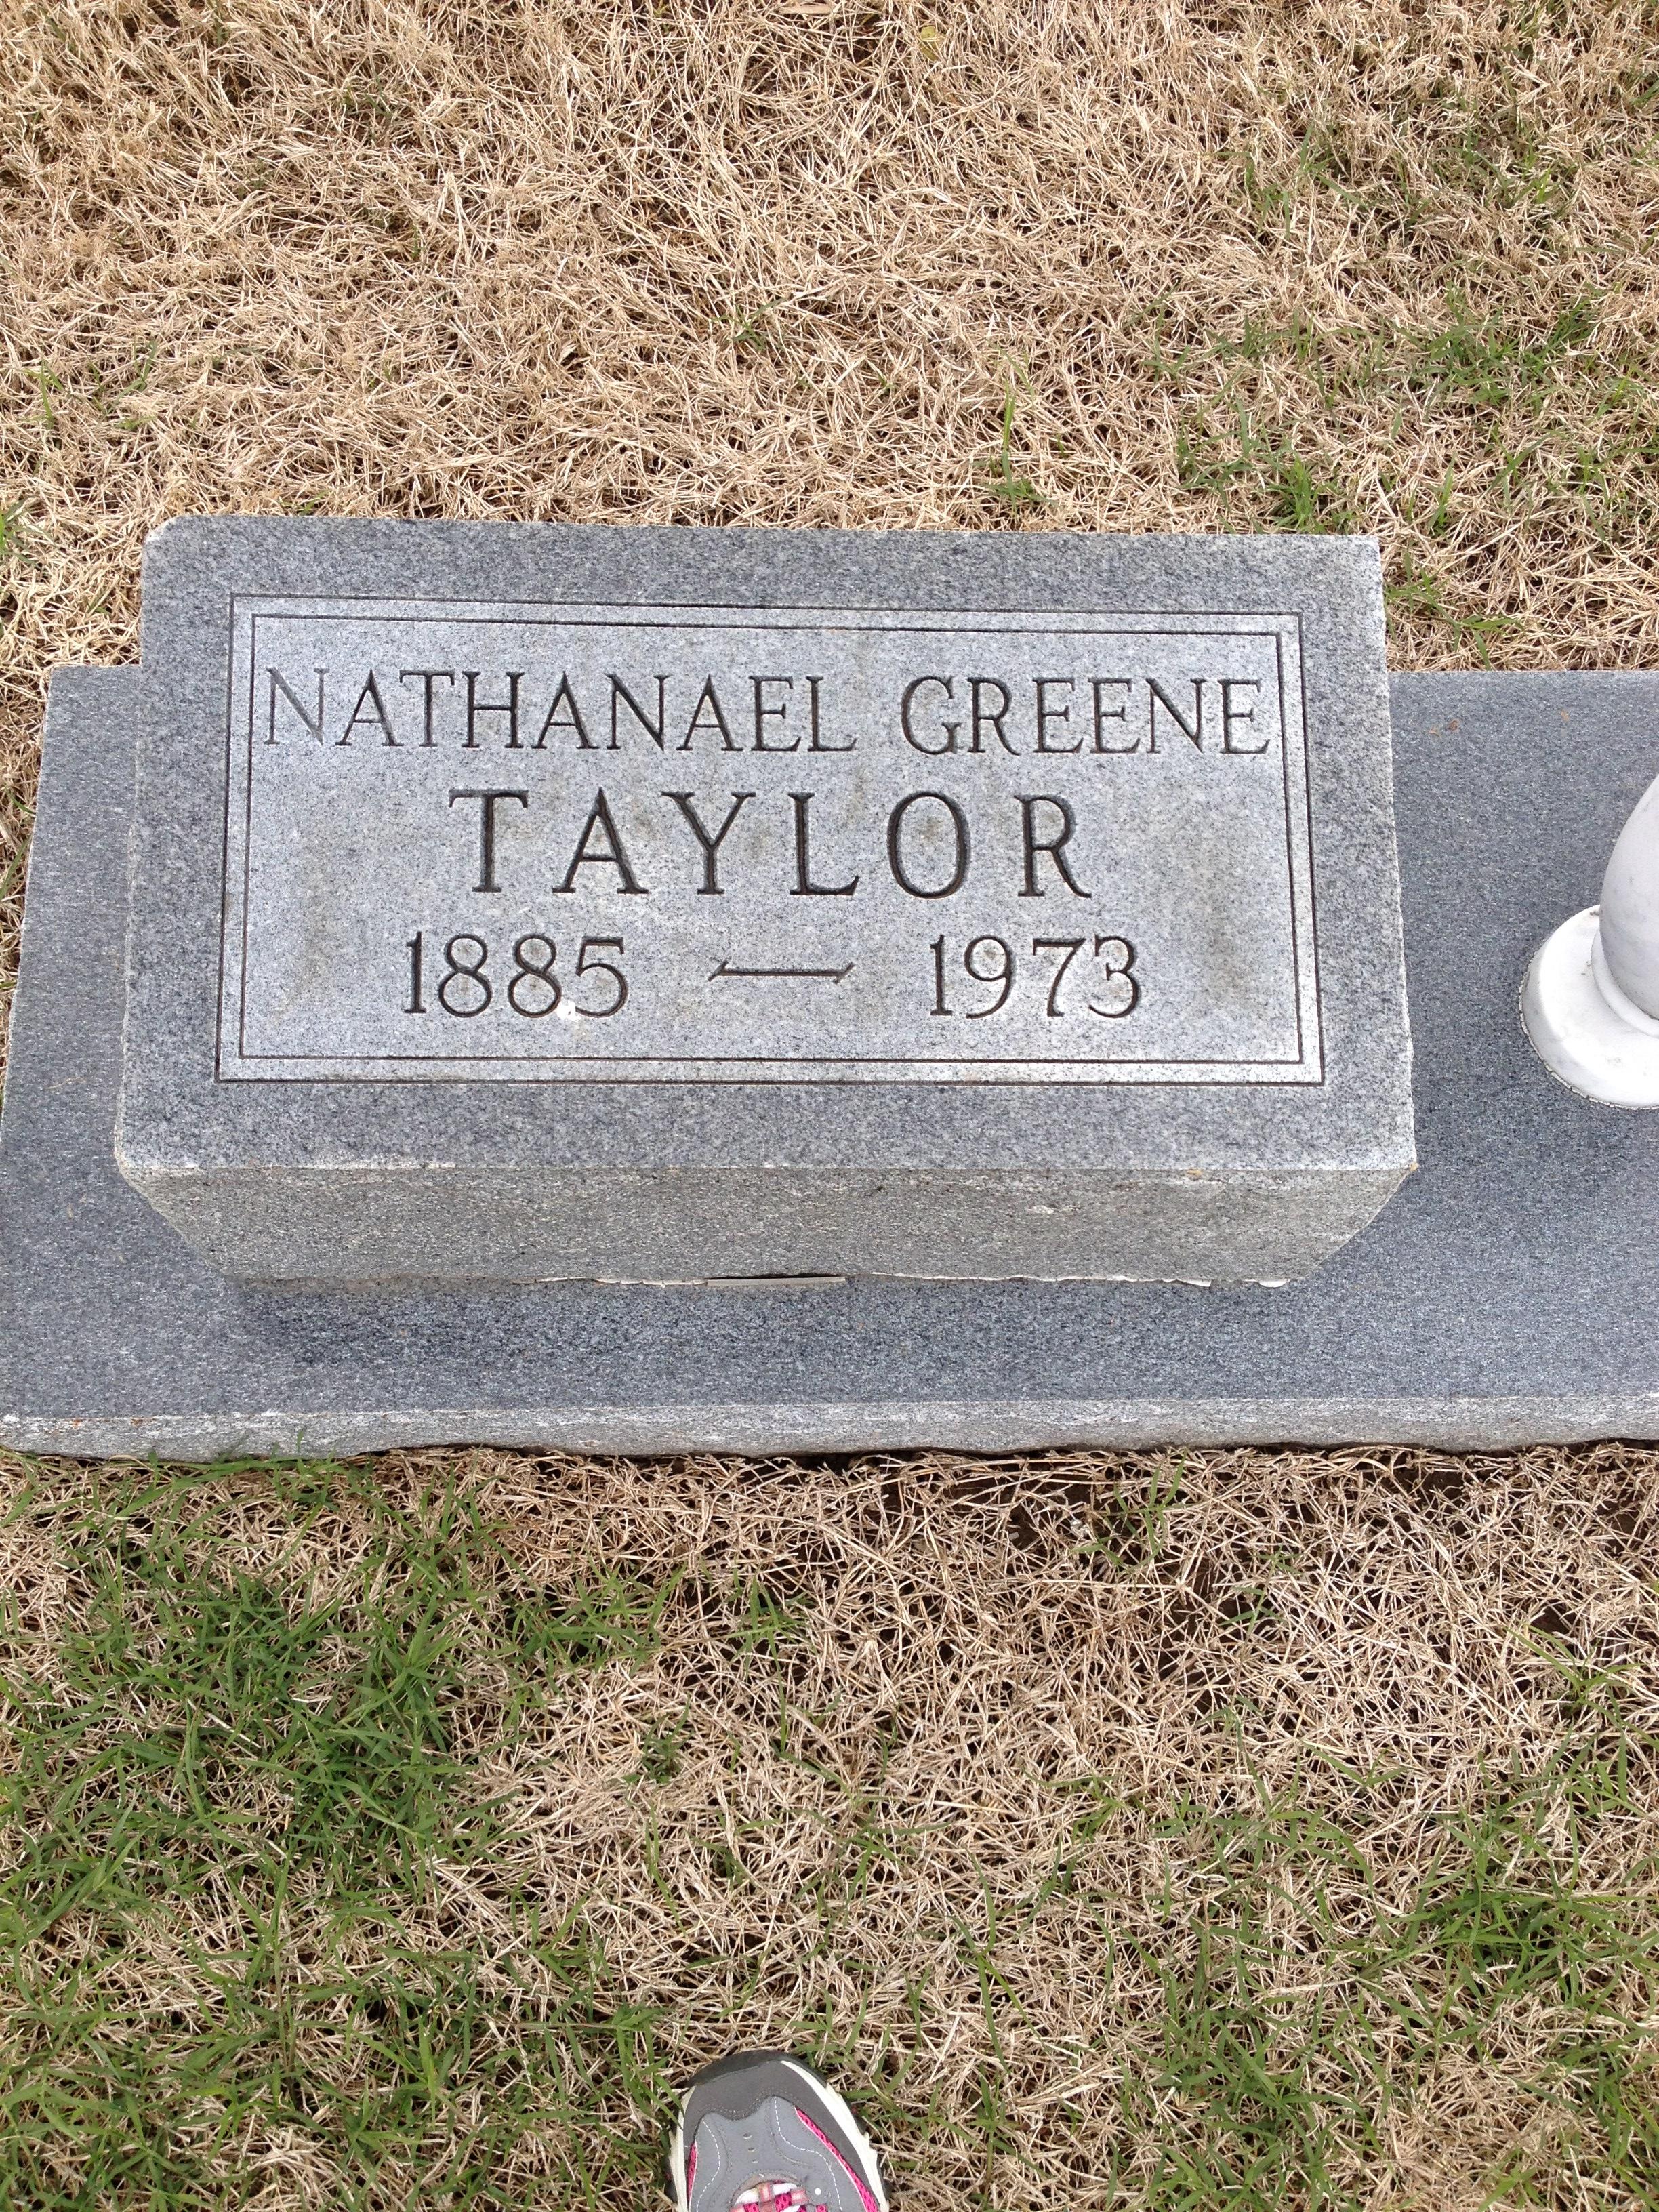 Nathaniel Greene Taylor